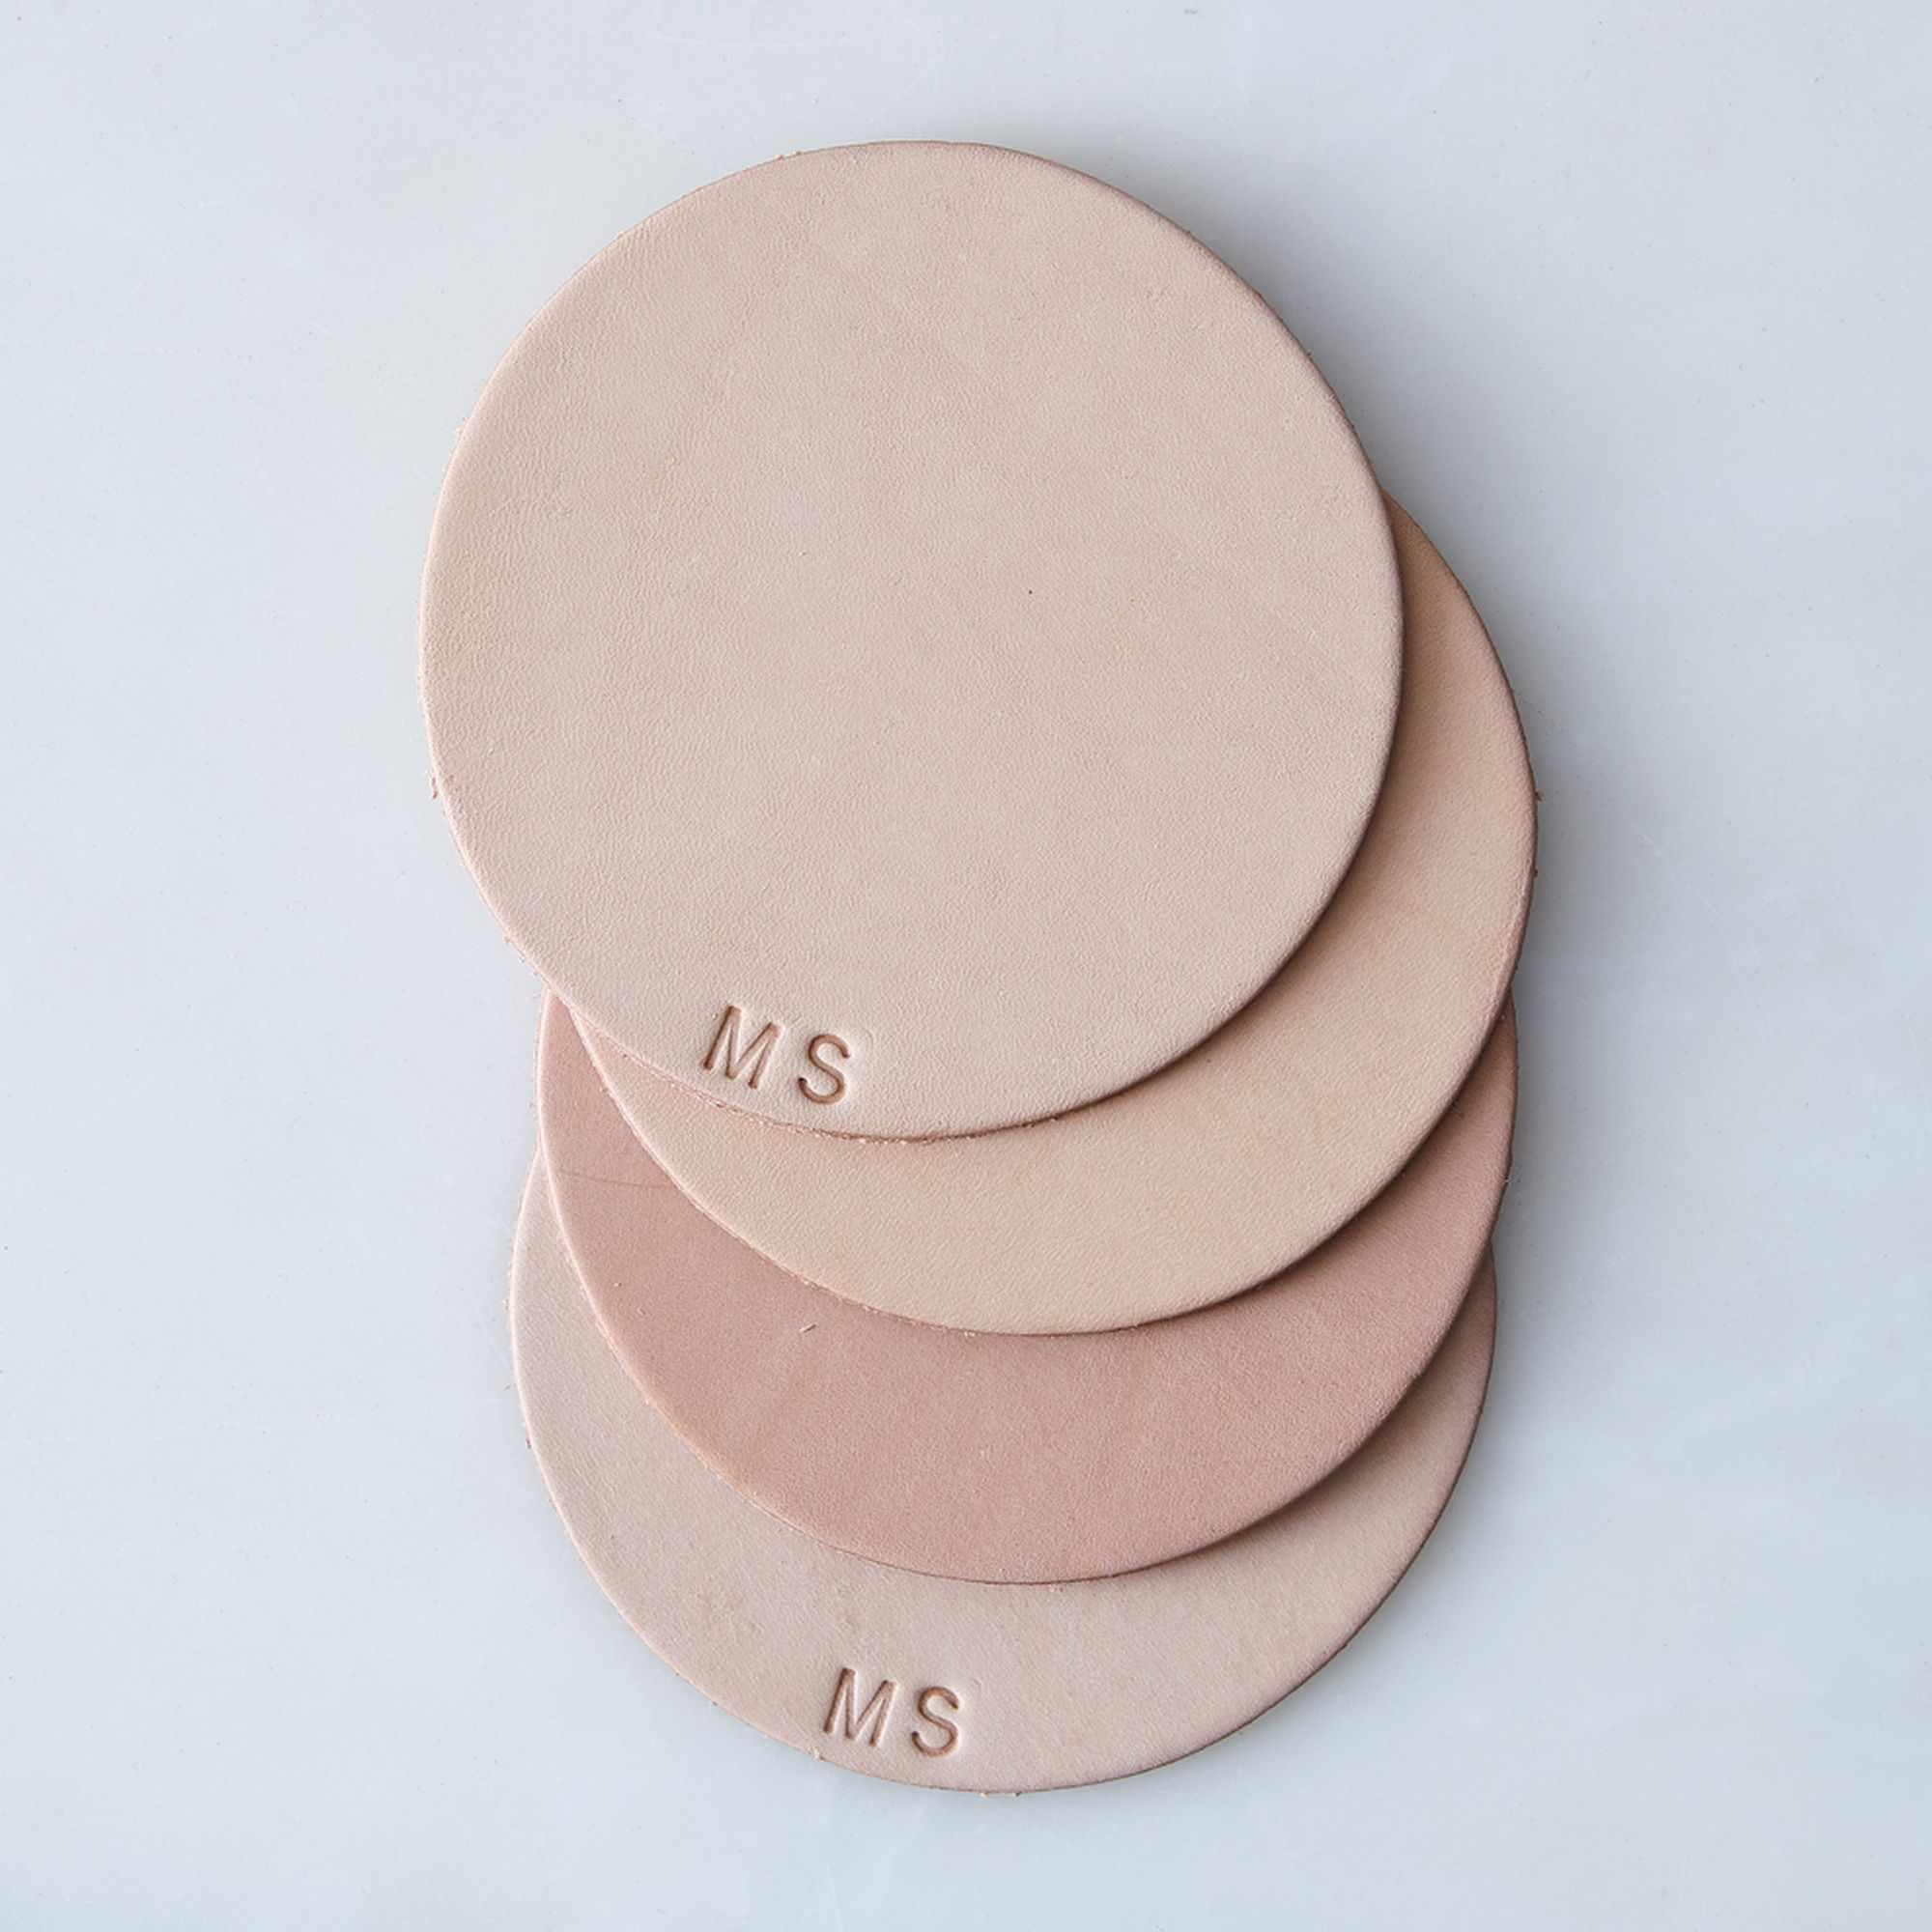 Celina Mancurti Monogram Leather Coasters